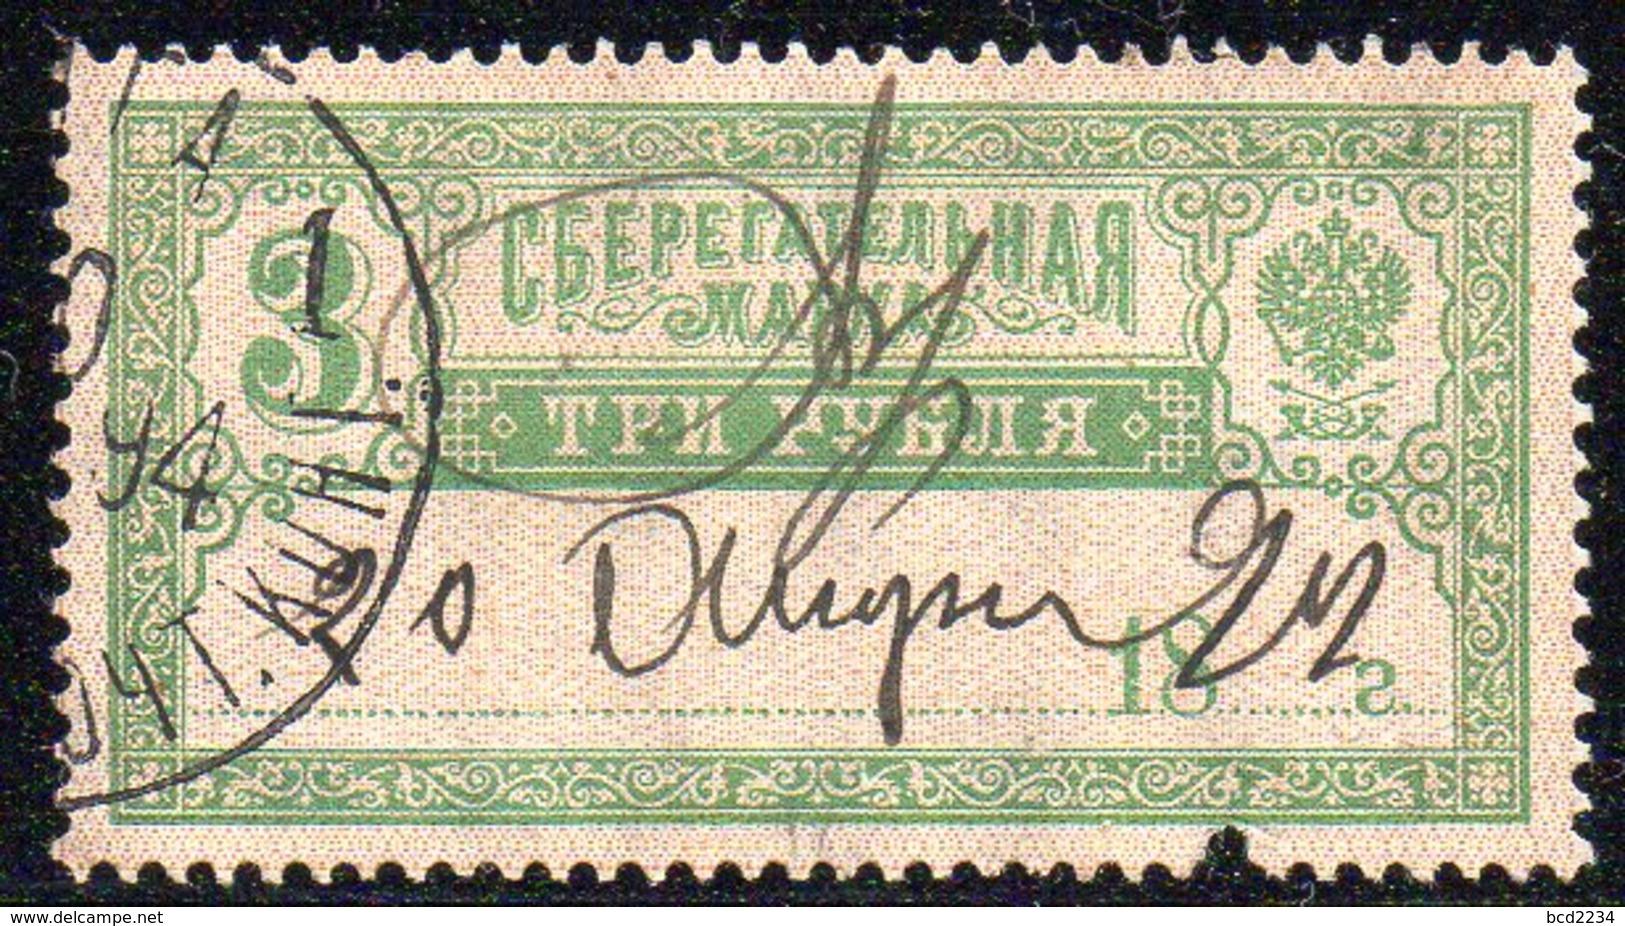 RUSSIA 1890 POSTAL SAVINGS RECEIPT REVENUE 3R YELLOW-GREEN STEUERMARKE FISCAUX USED 1894 USSR - Fiscale Zegels